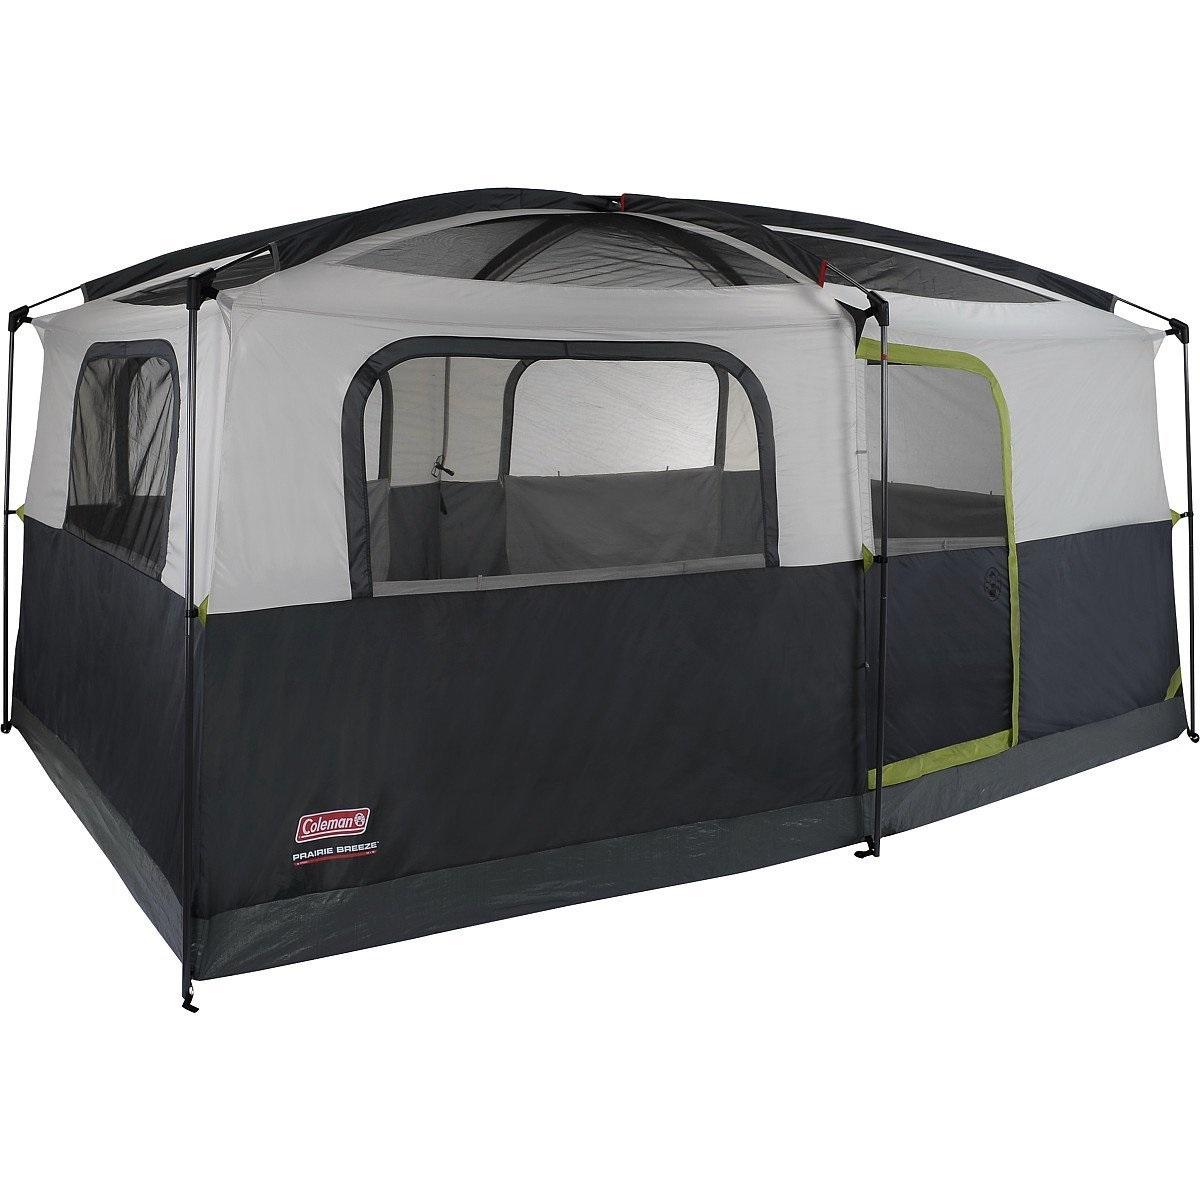 Signature Tent 14X10 Prairie Breeze Led/Fan 2000008055. Coleman Prairie Breeze 9 Person ...  sc 1 st  eBay & Signature Tent 14X10 Prairie Breeze Led/Fan 2000008055 | eBay